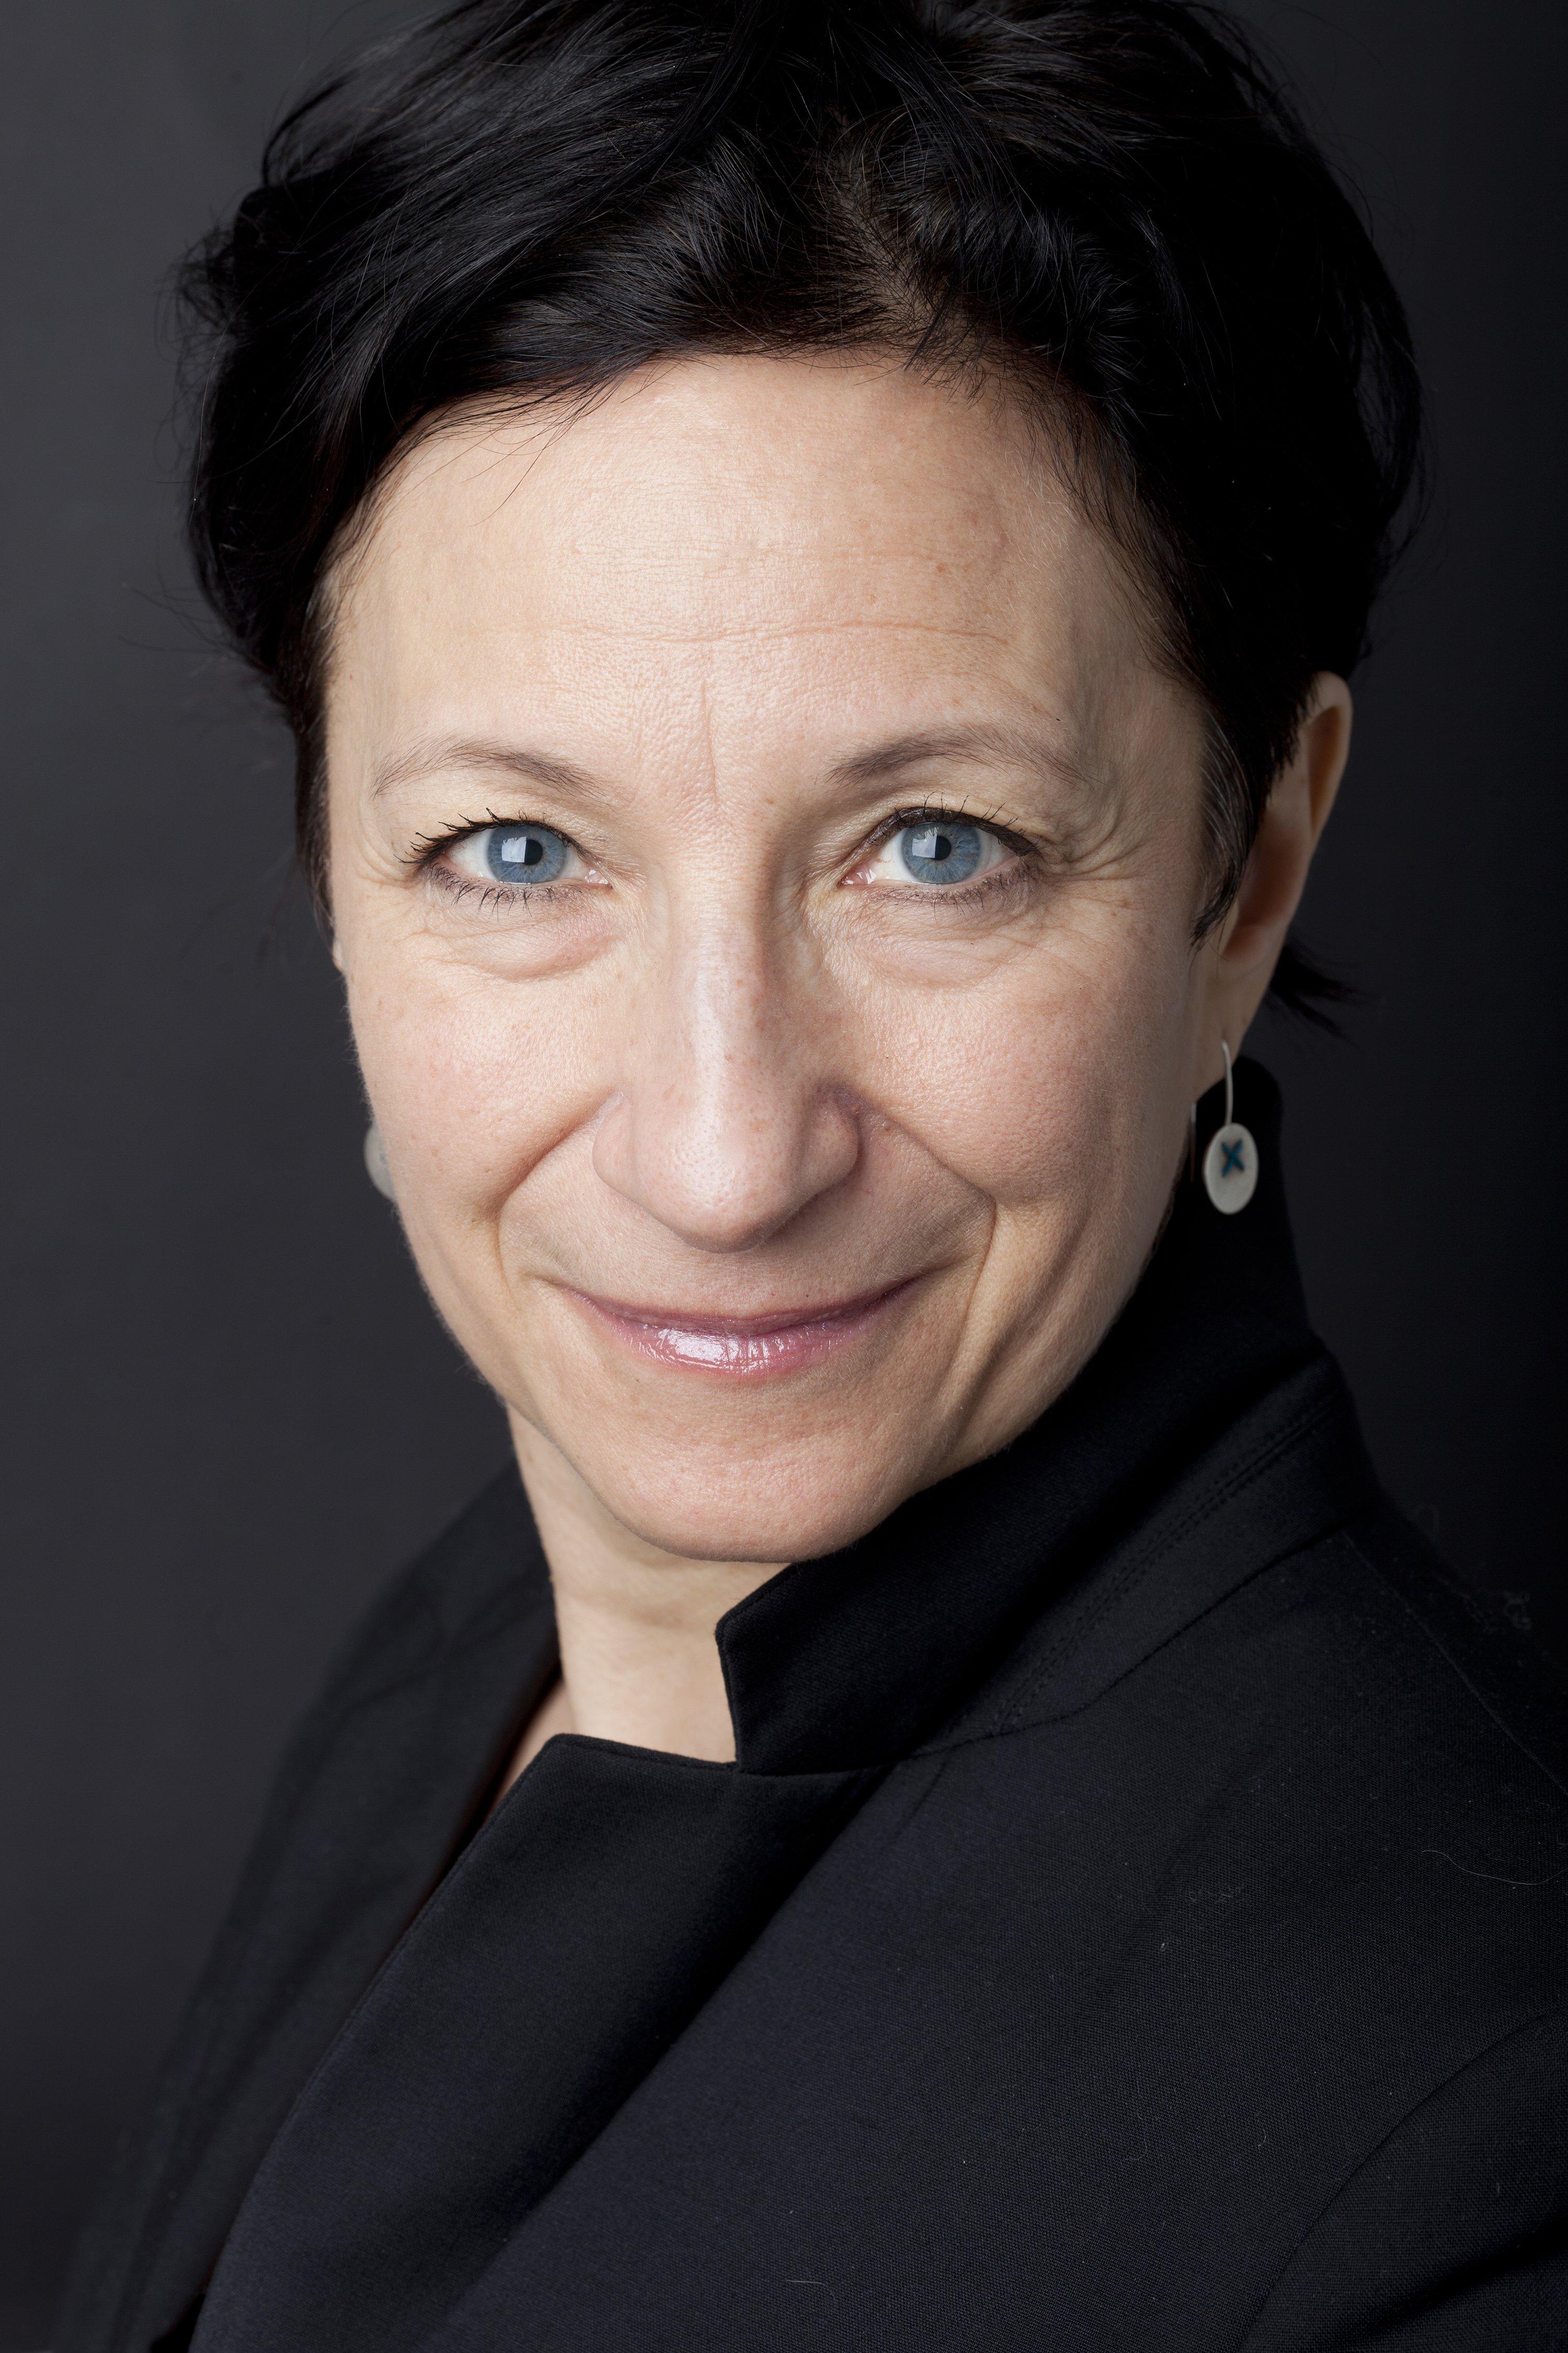 Spotlight: Ina-Miriam Rosenbaum